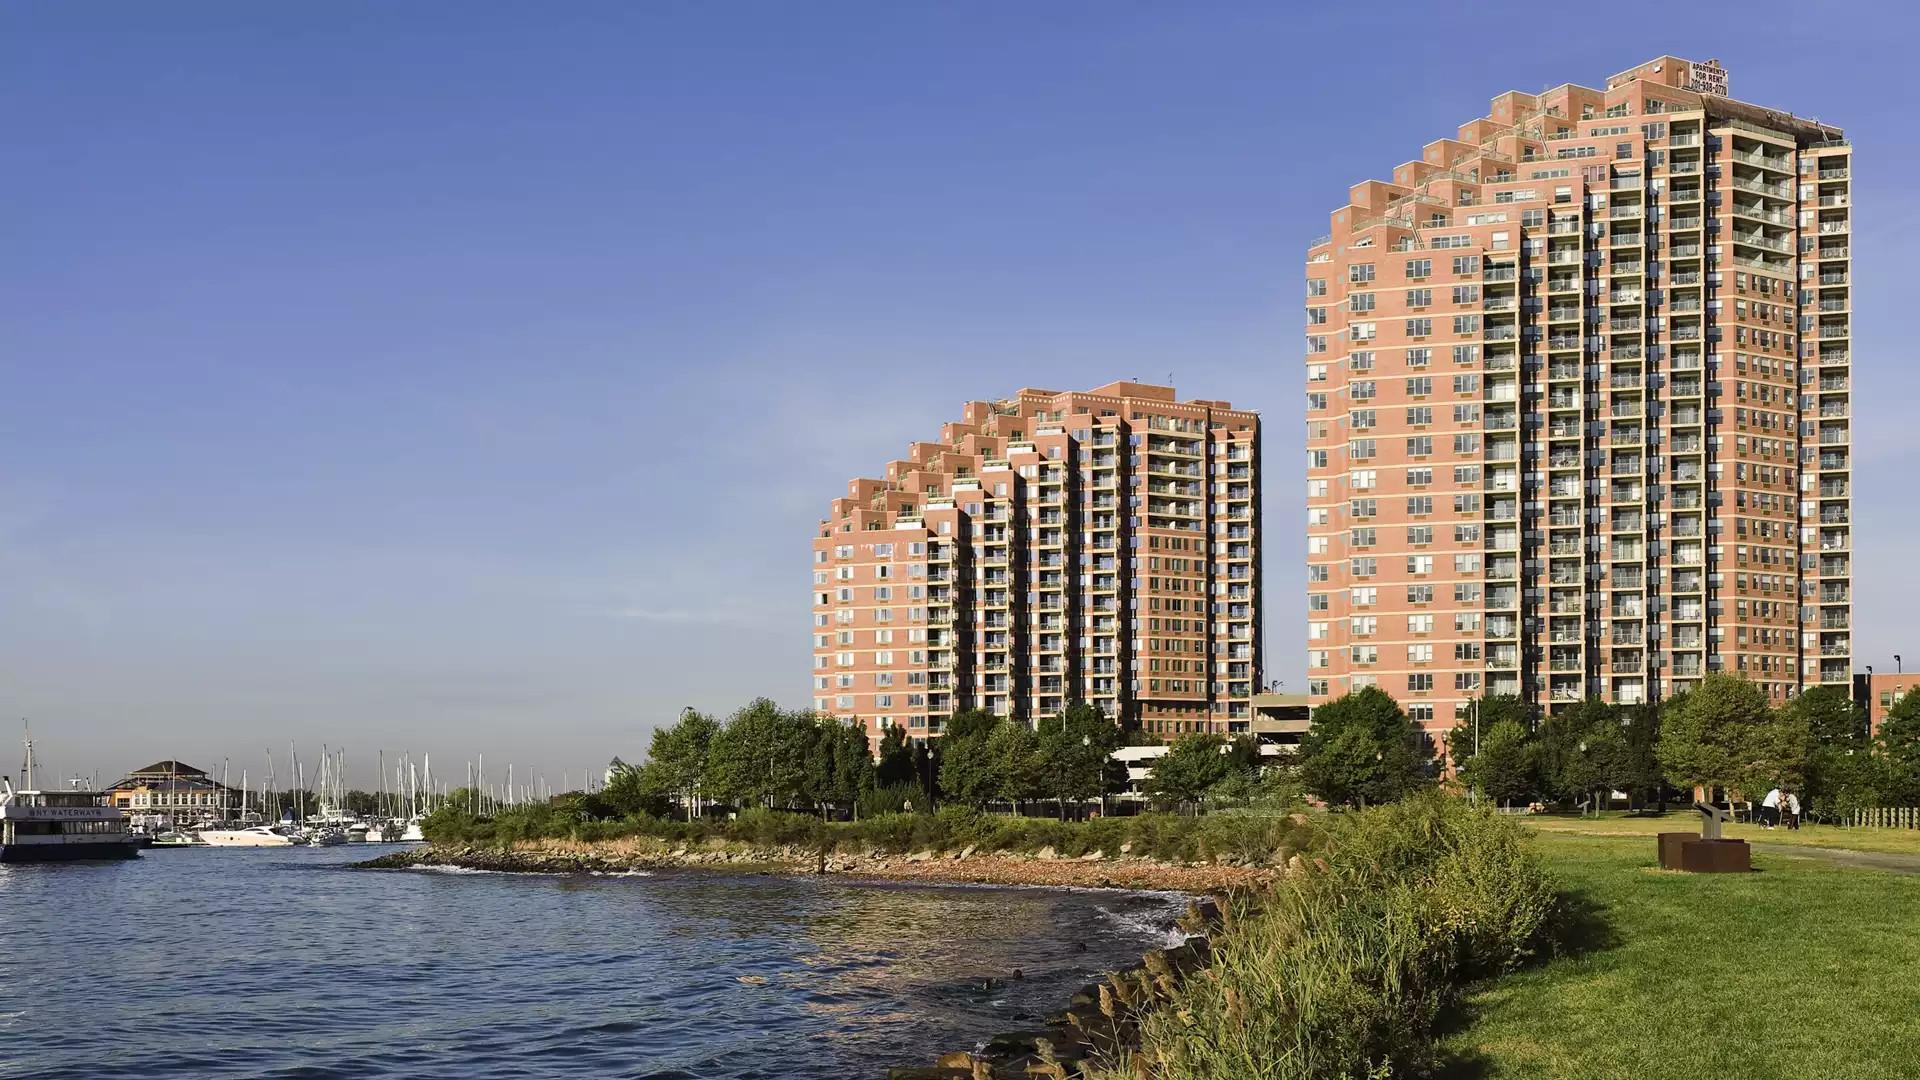 Portside Towers Apartments - Jersey City, NJ